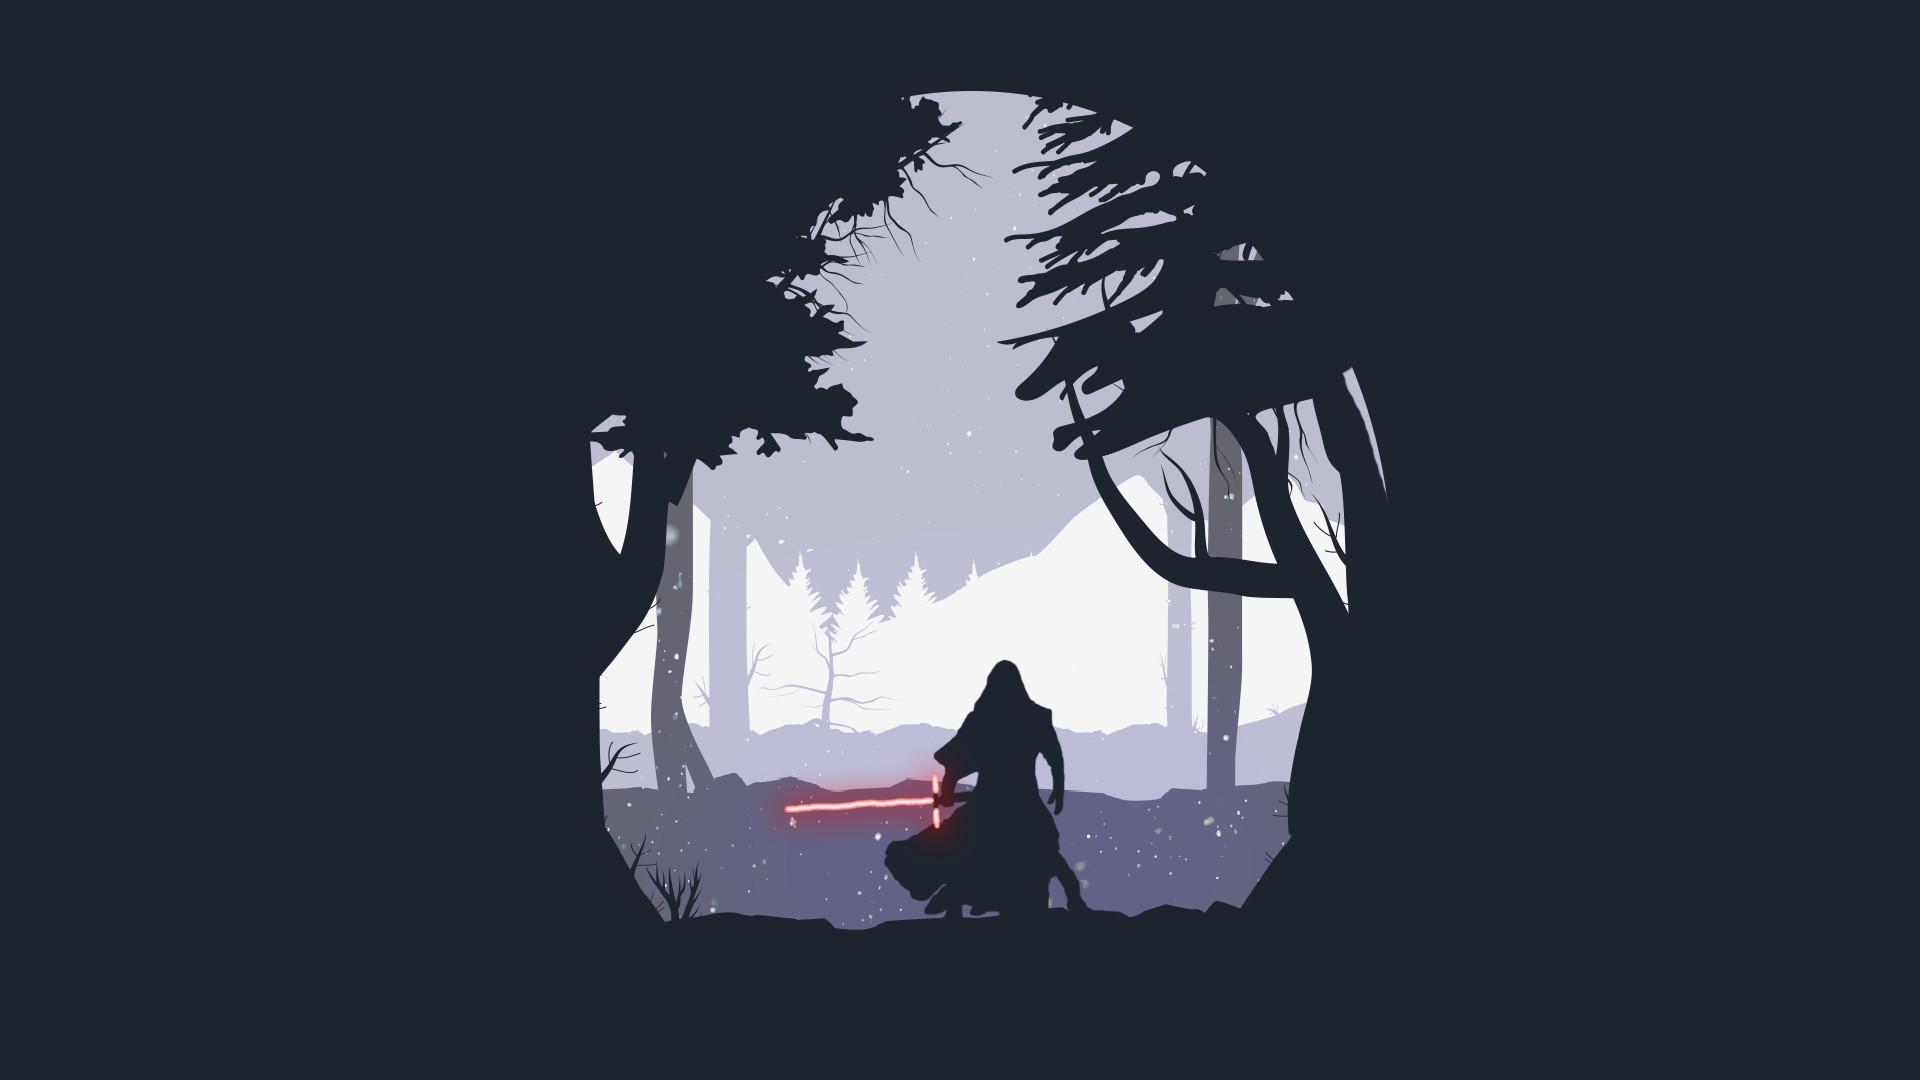 Star Wars HD Wallpapers, 156.72 Kb, Tana Carpino